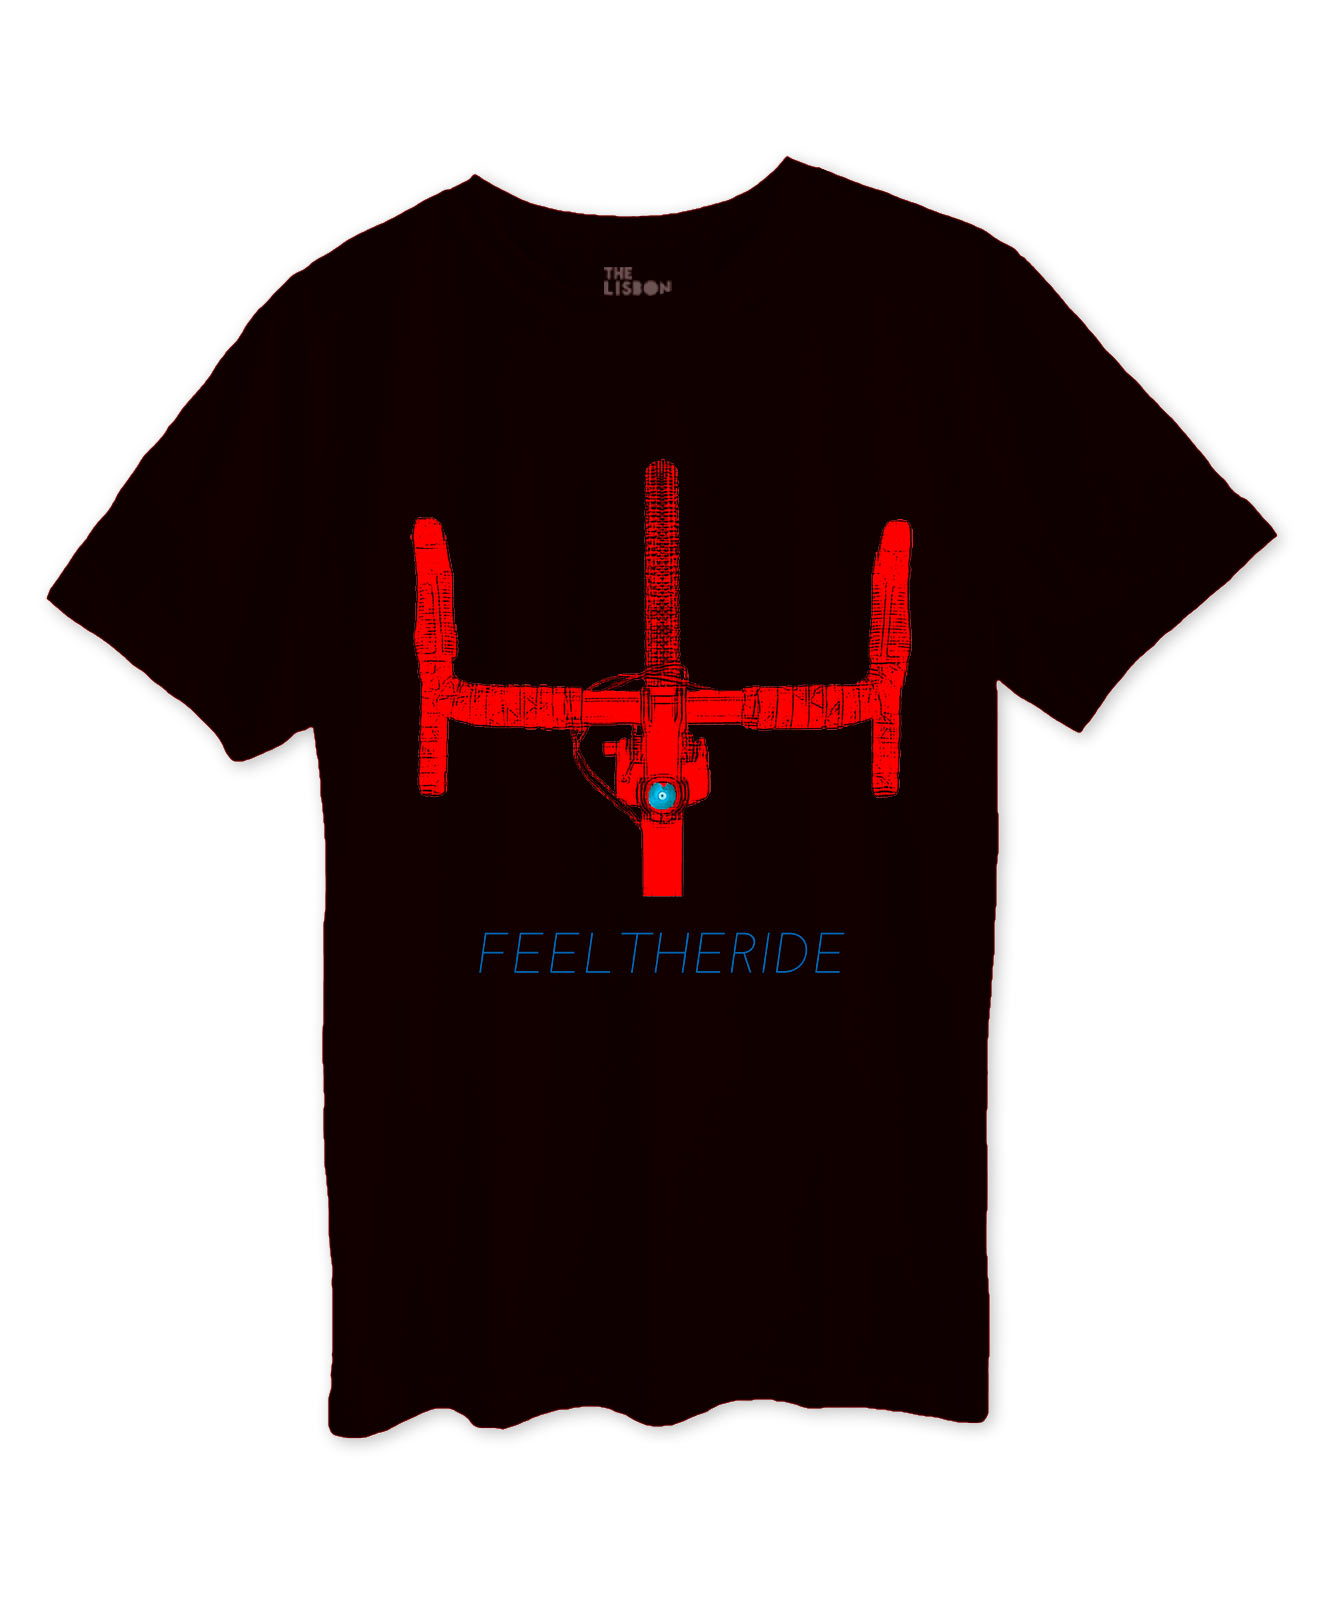 Road Bike Handlebar Black T-shirt red printing